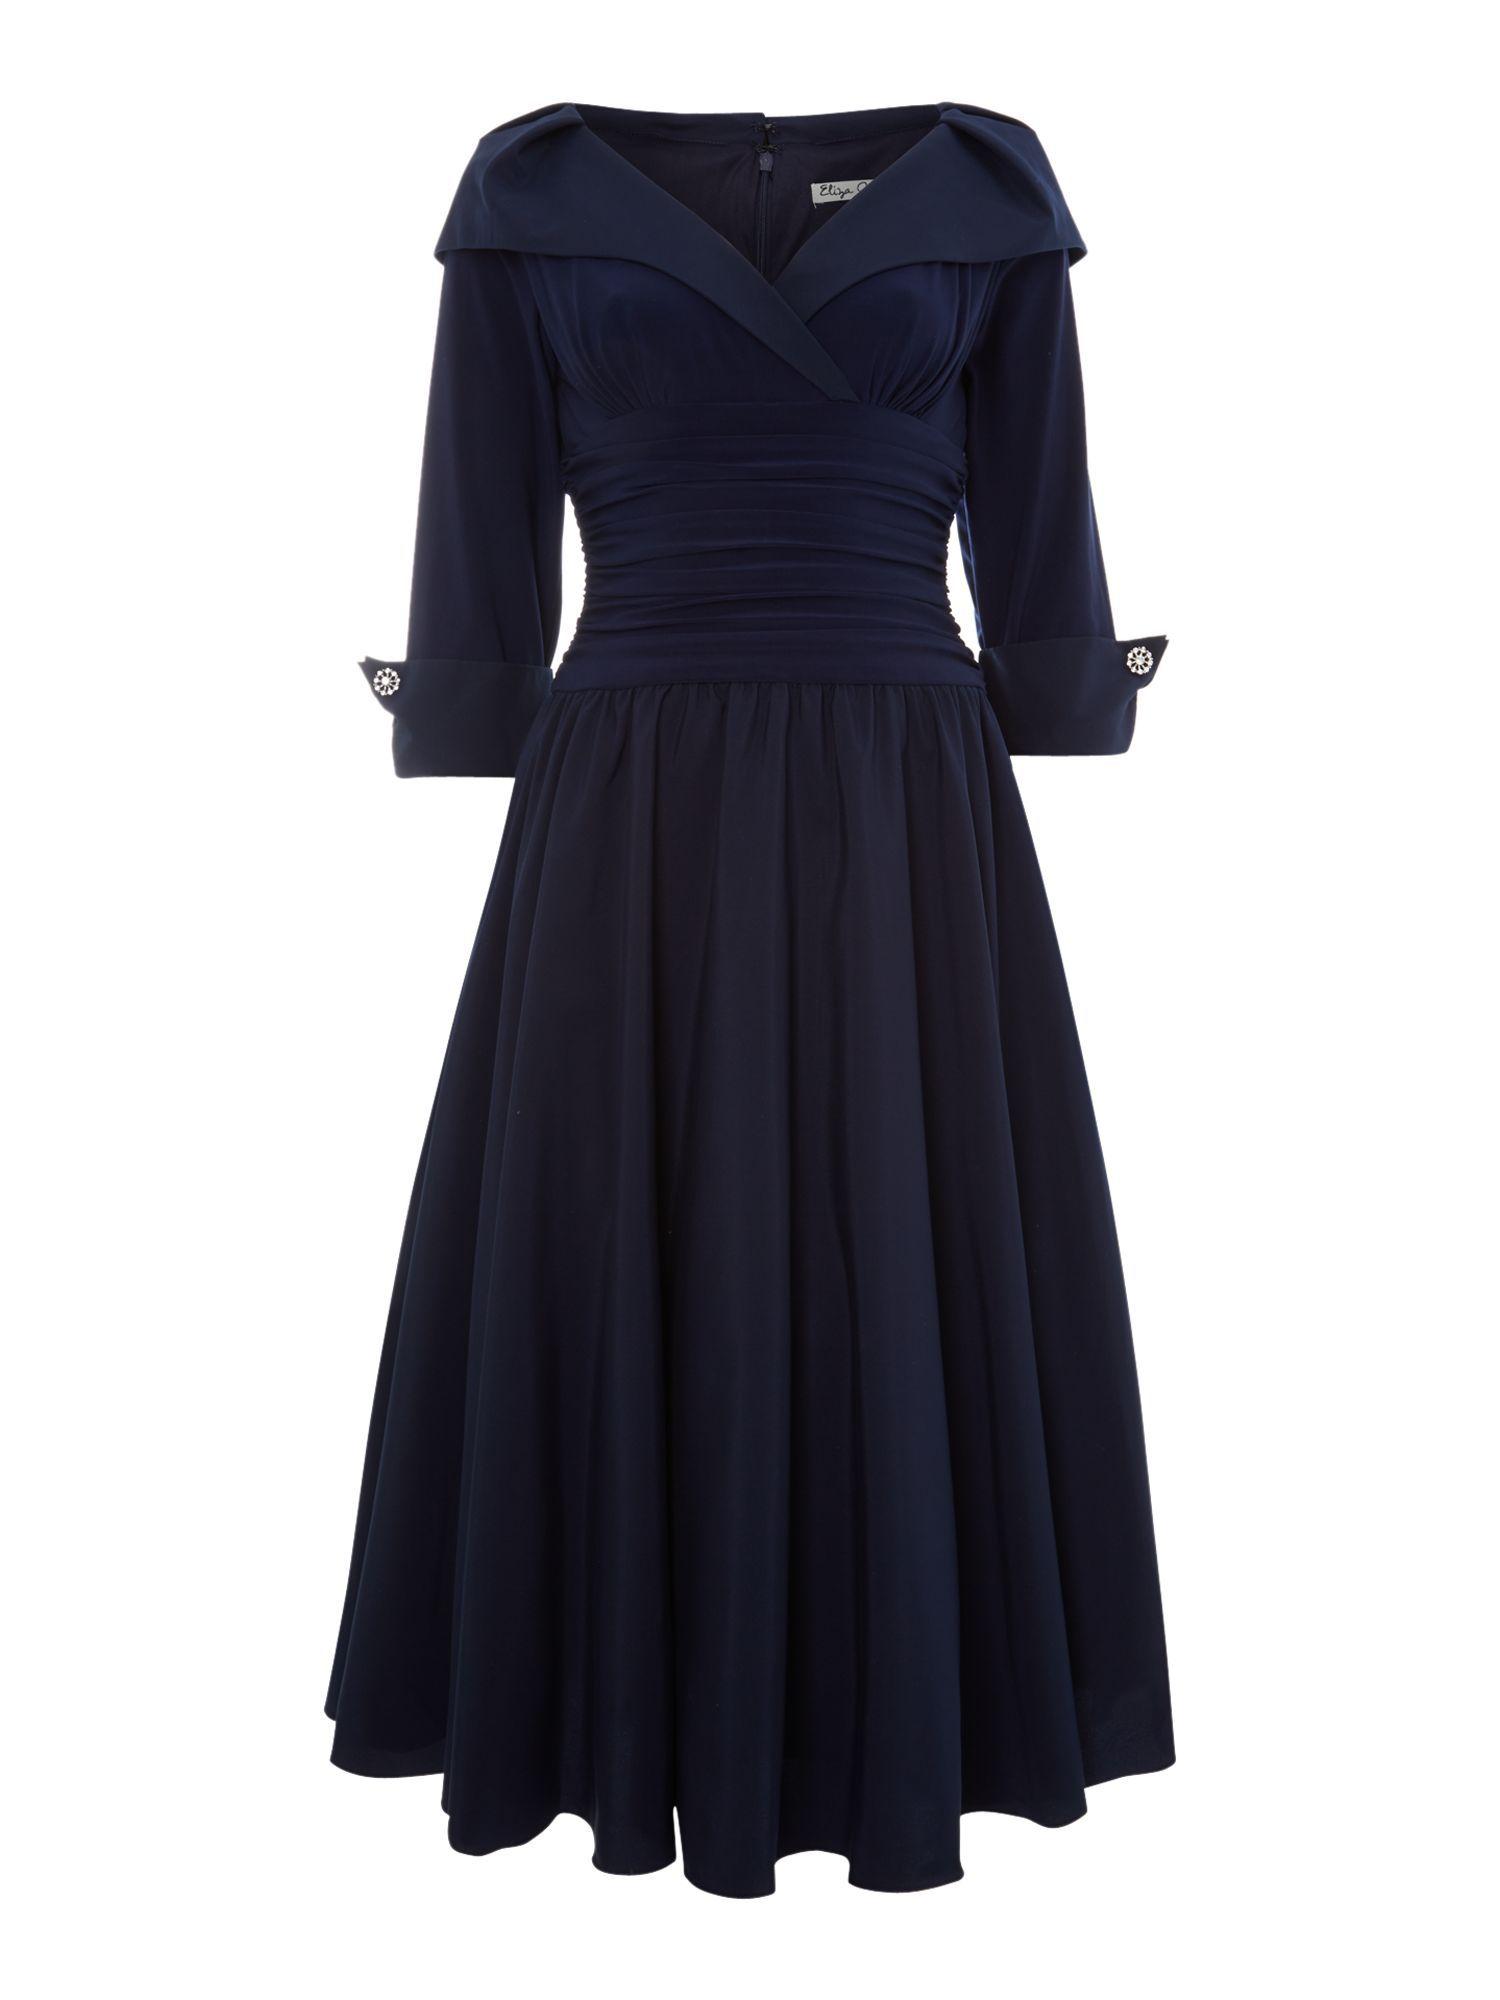 350842b2492f2c Eliza J 3 4 sleeve ruched waist dress offers enviable Hepburnesque  elegance